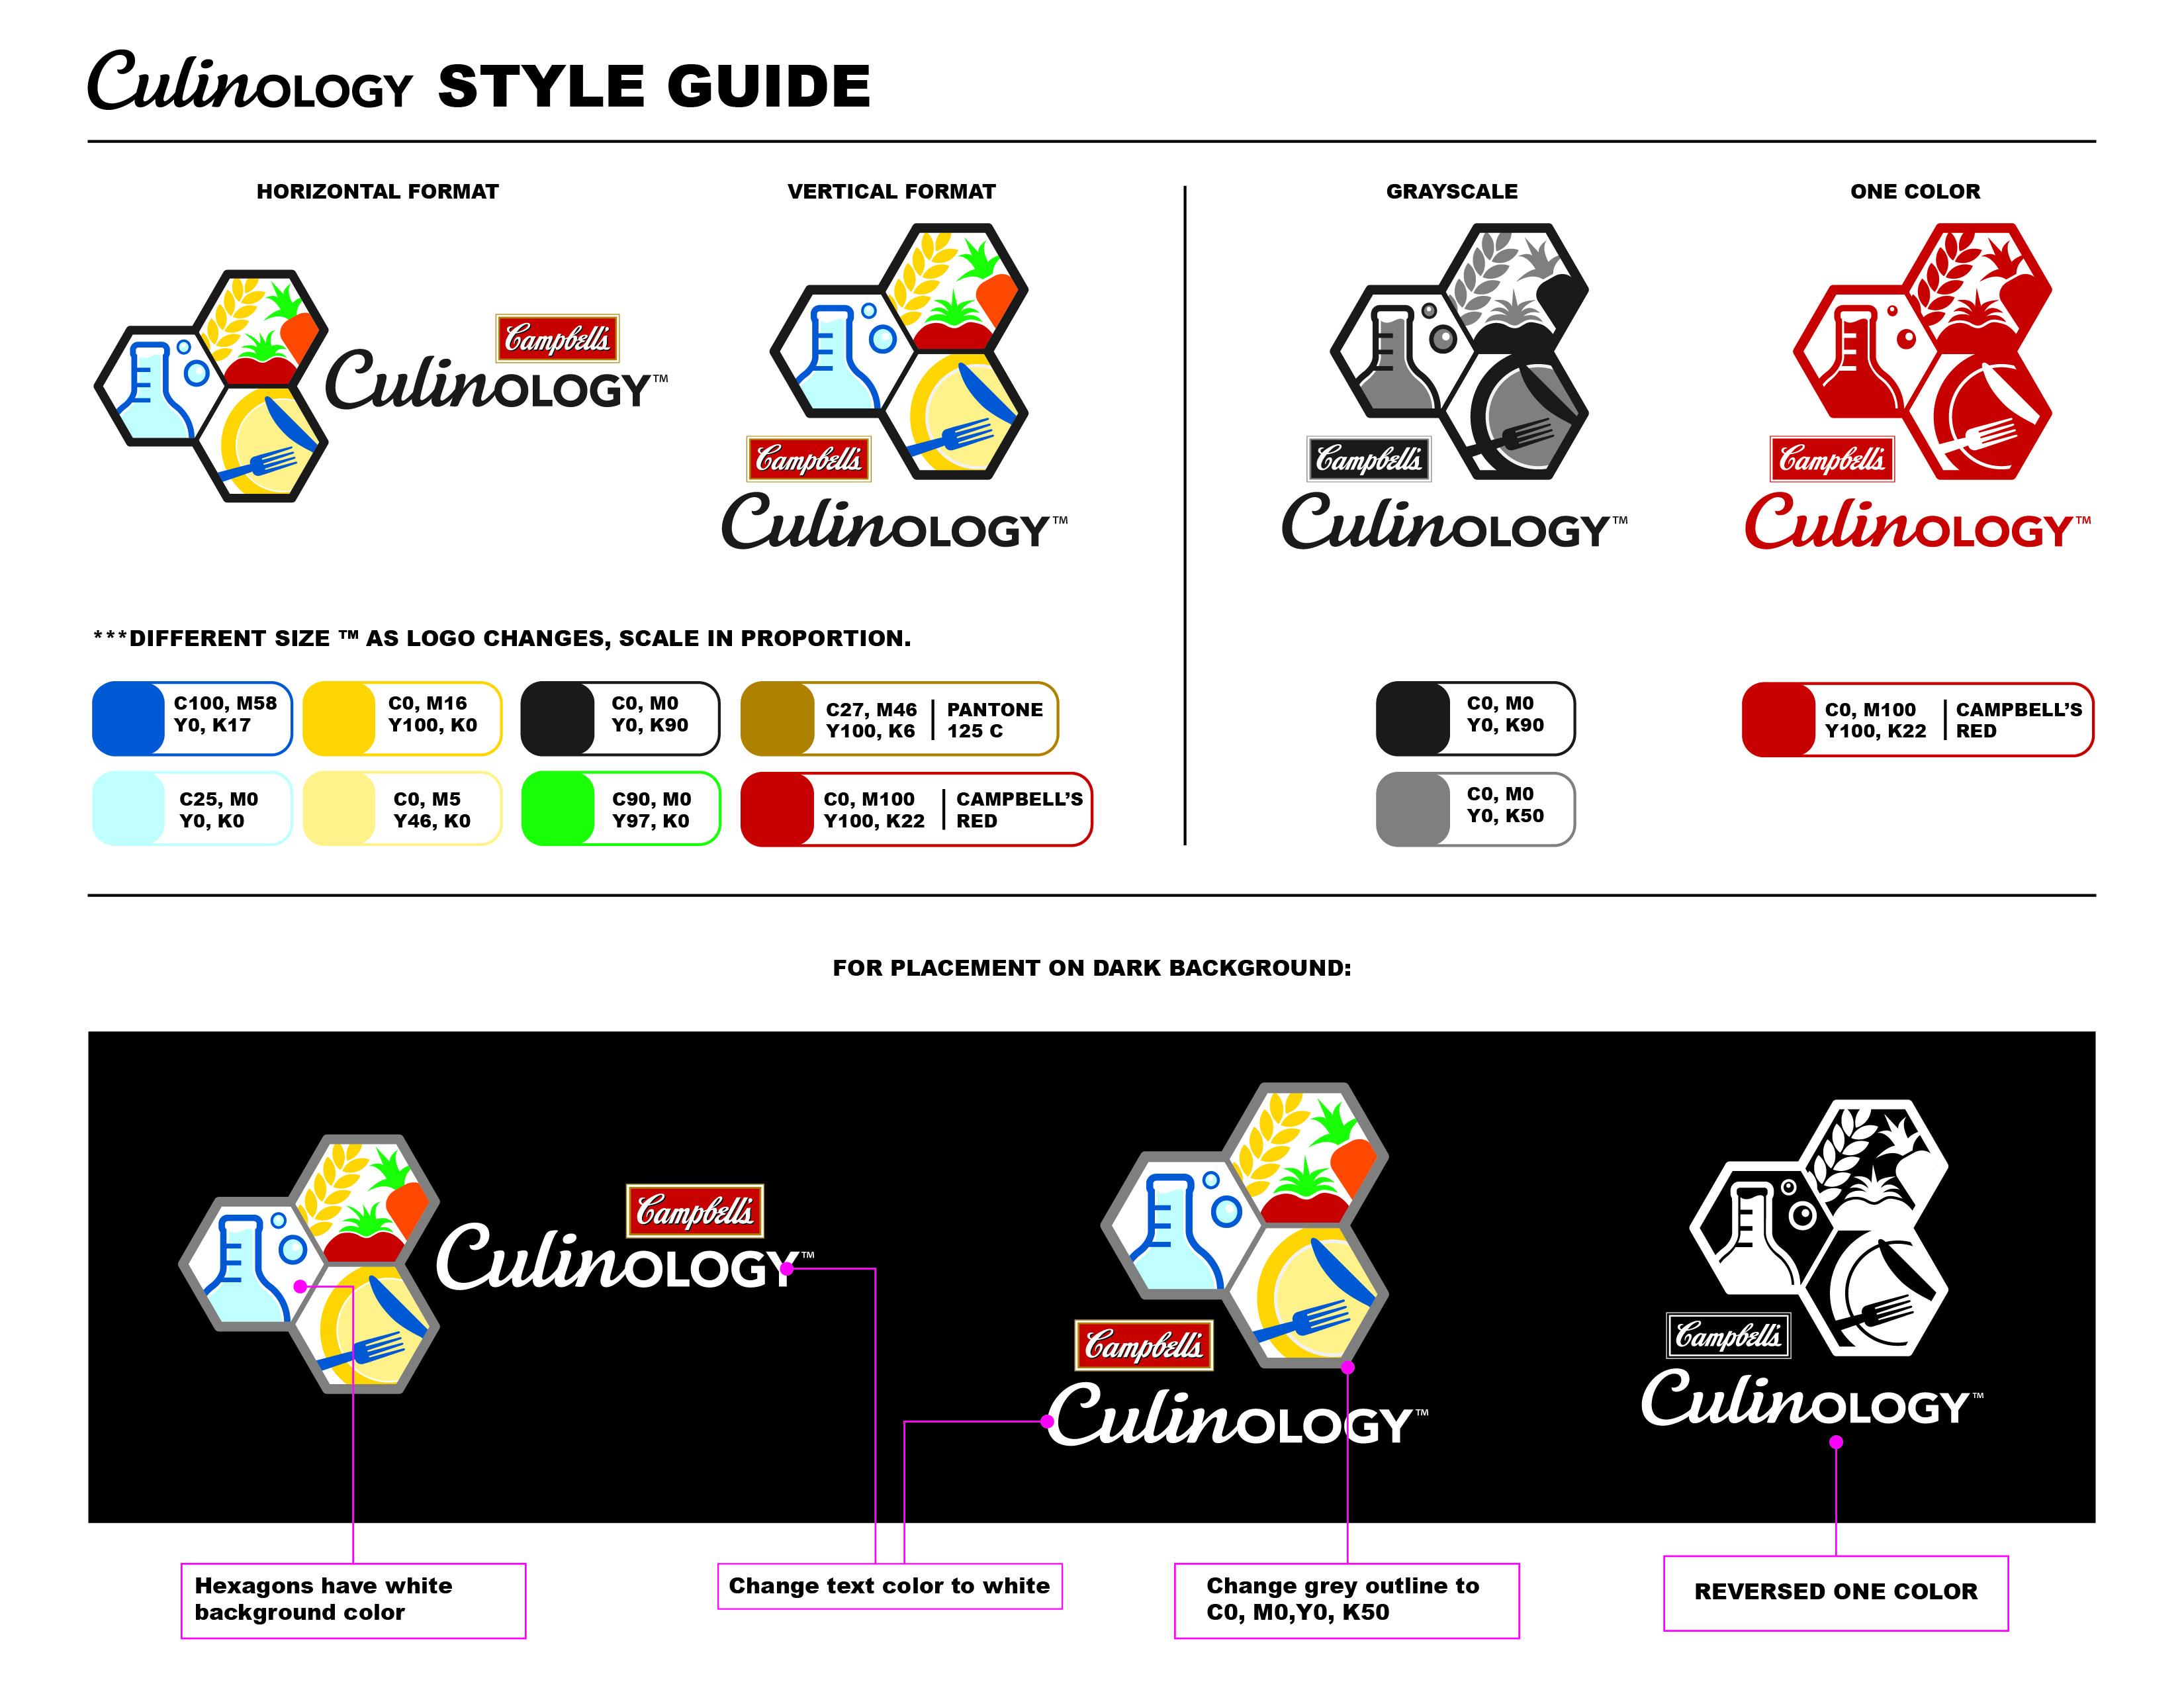 CulinologyLogo_StyleGuide-01